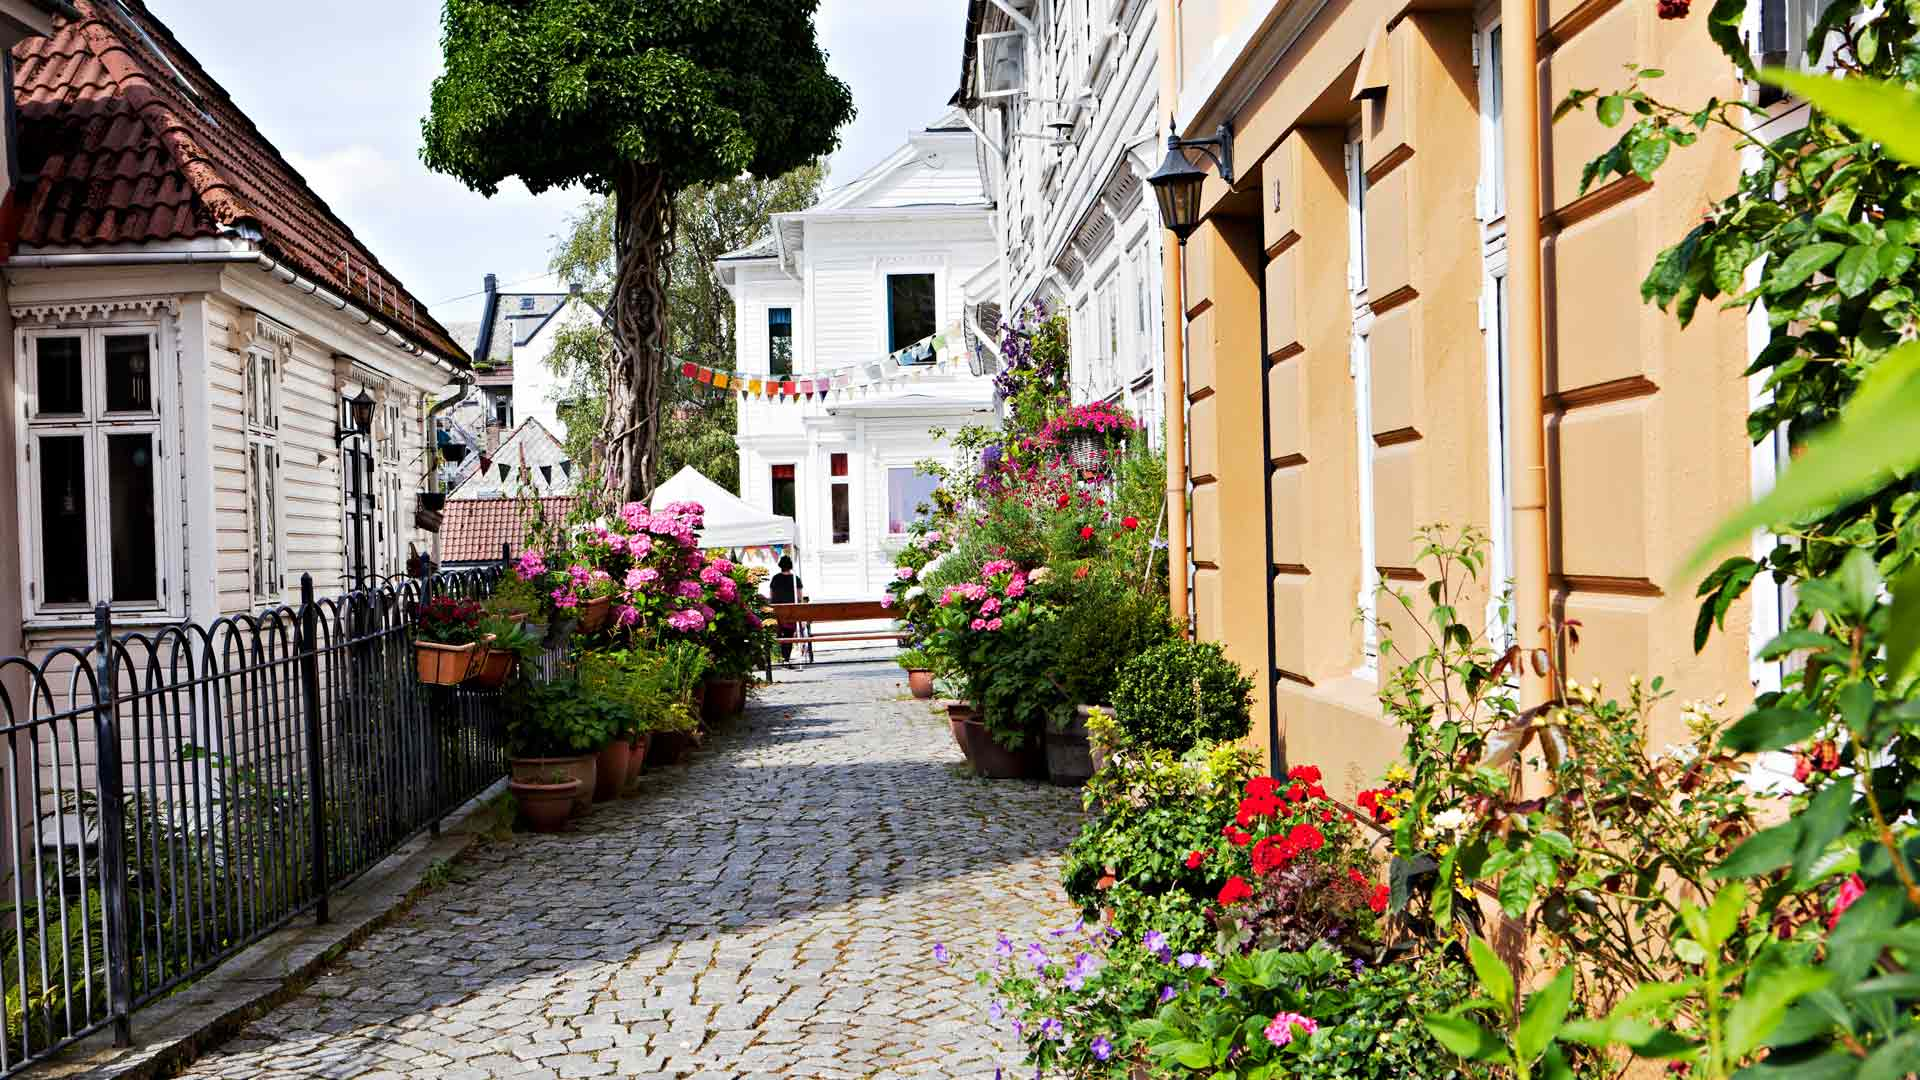 Vanhankaupungin kadut